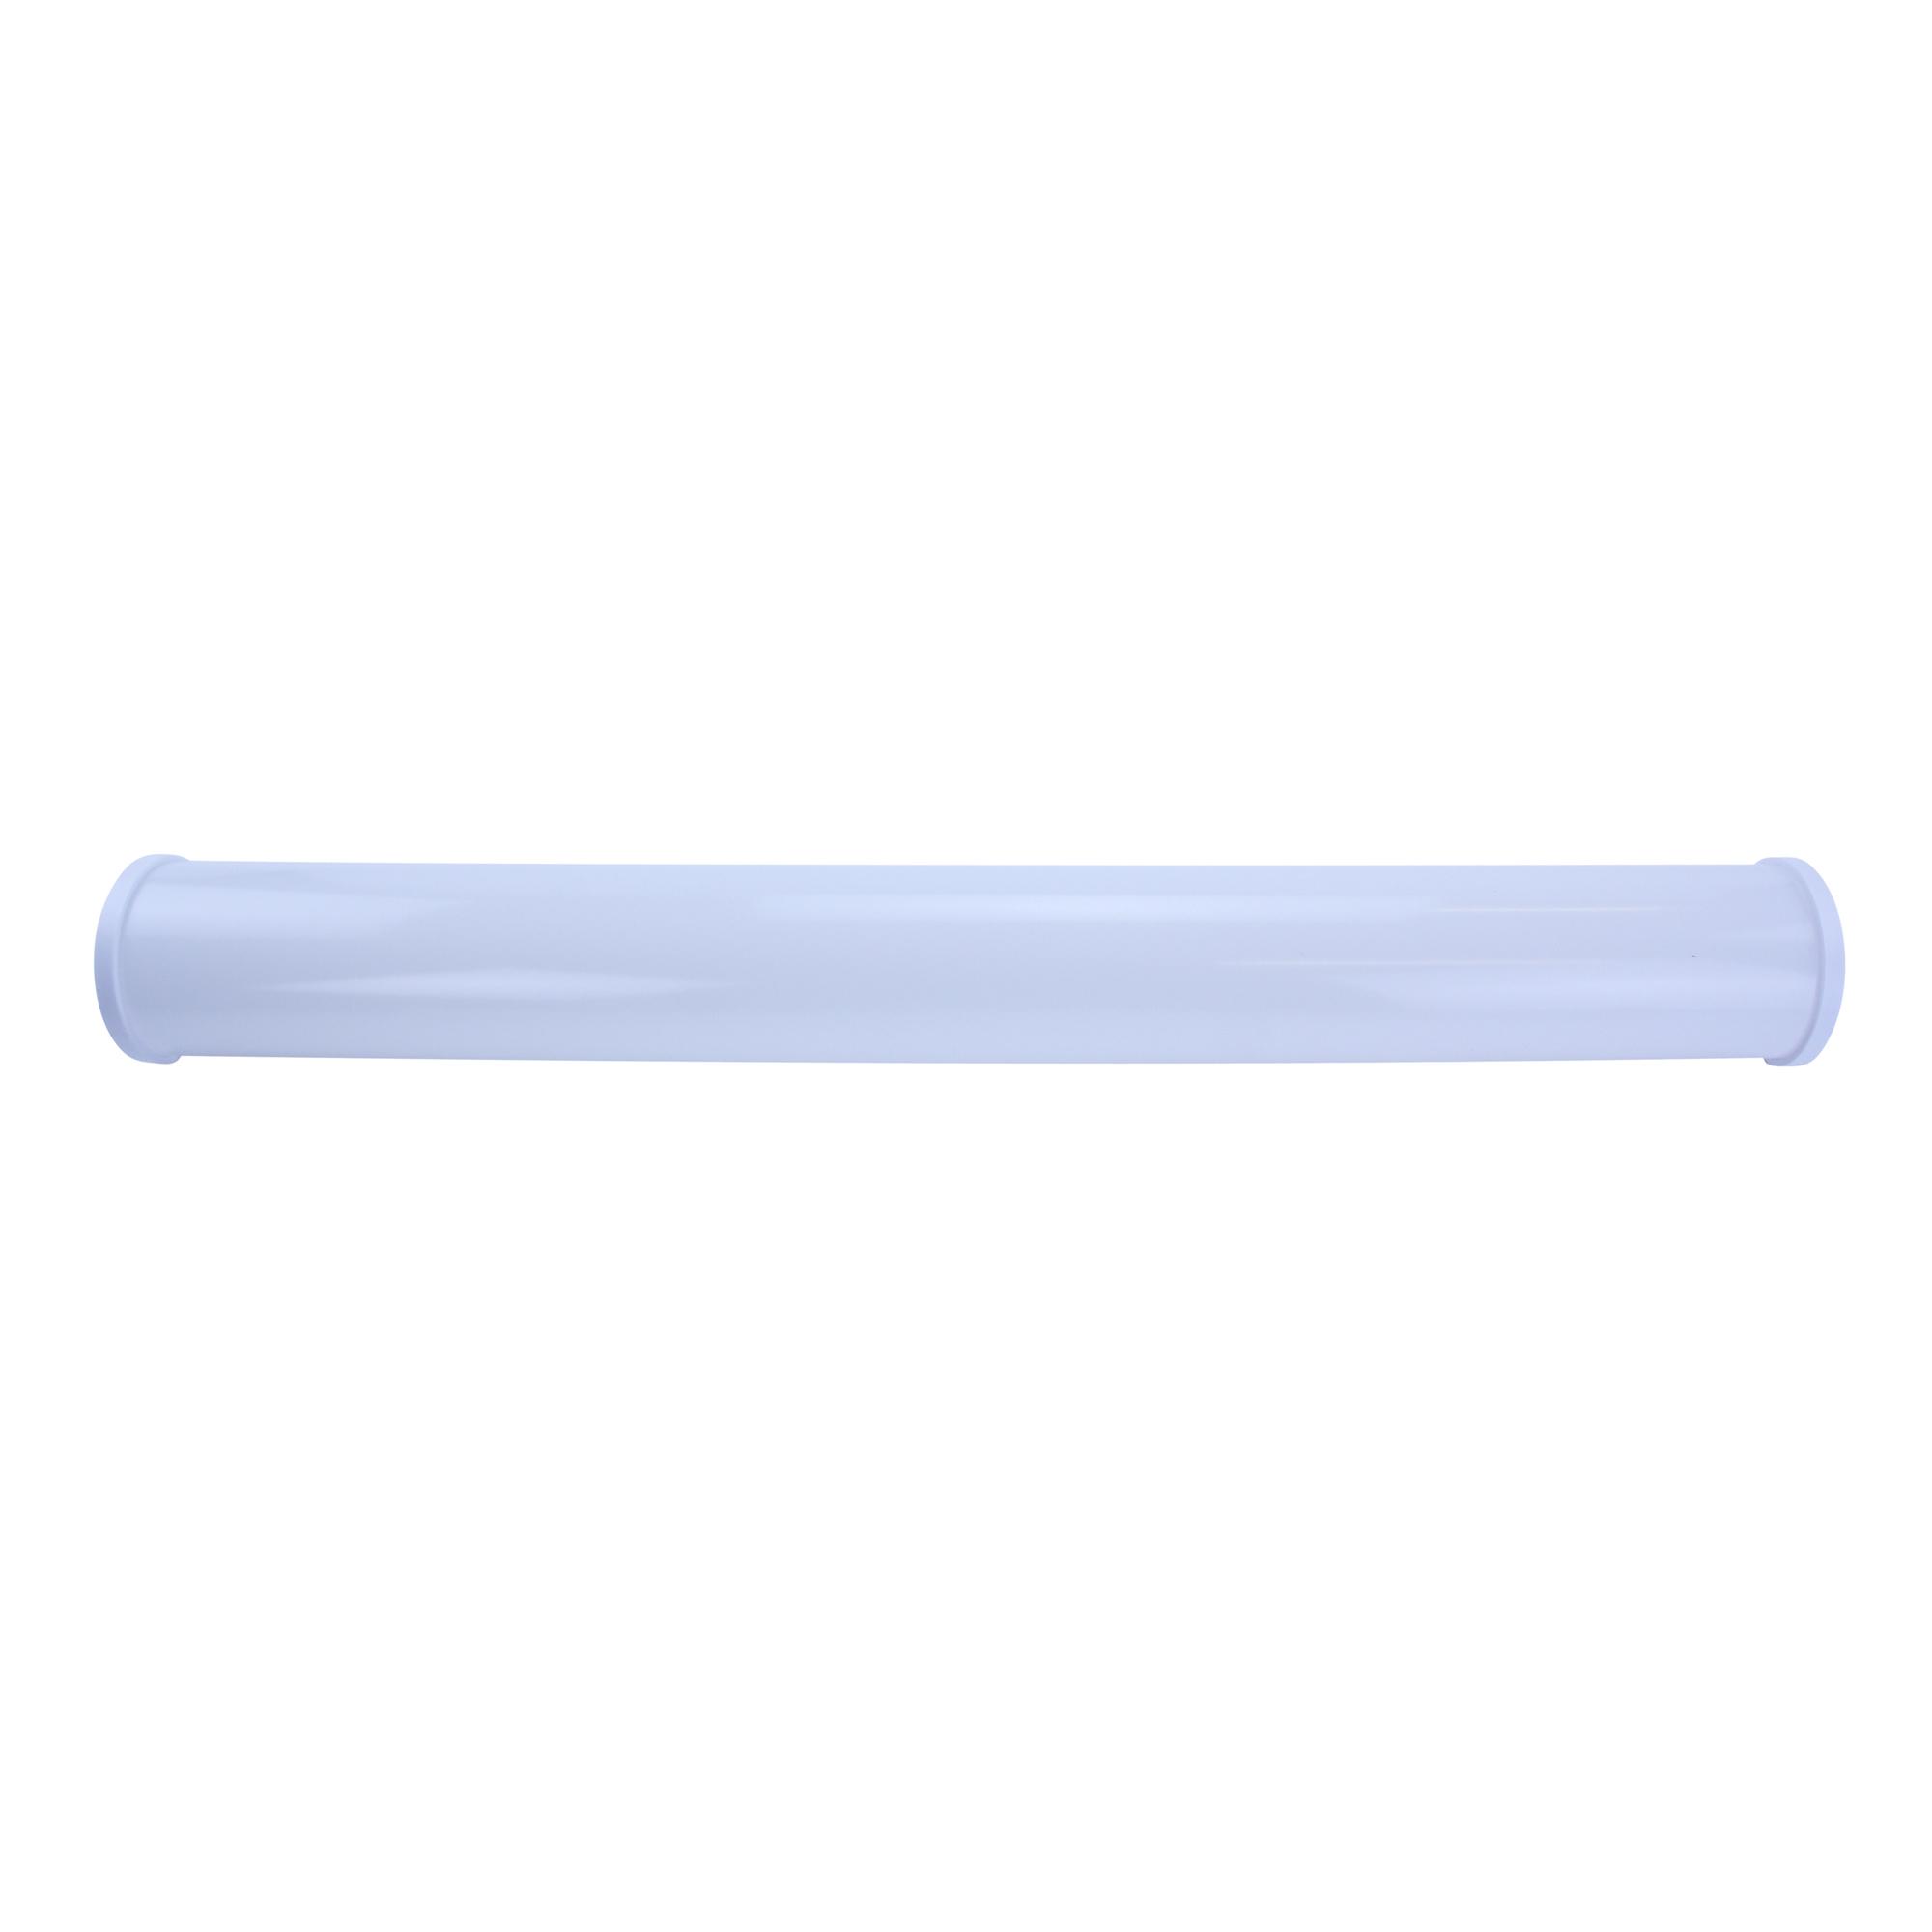 Simkar lighting wecn3swwsn225b11 120v fluorescent 3 39 wall - Fluorescent bathroom lighting fixtures ...